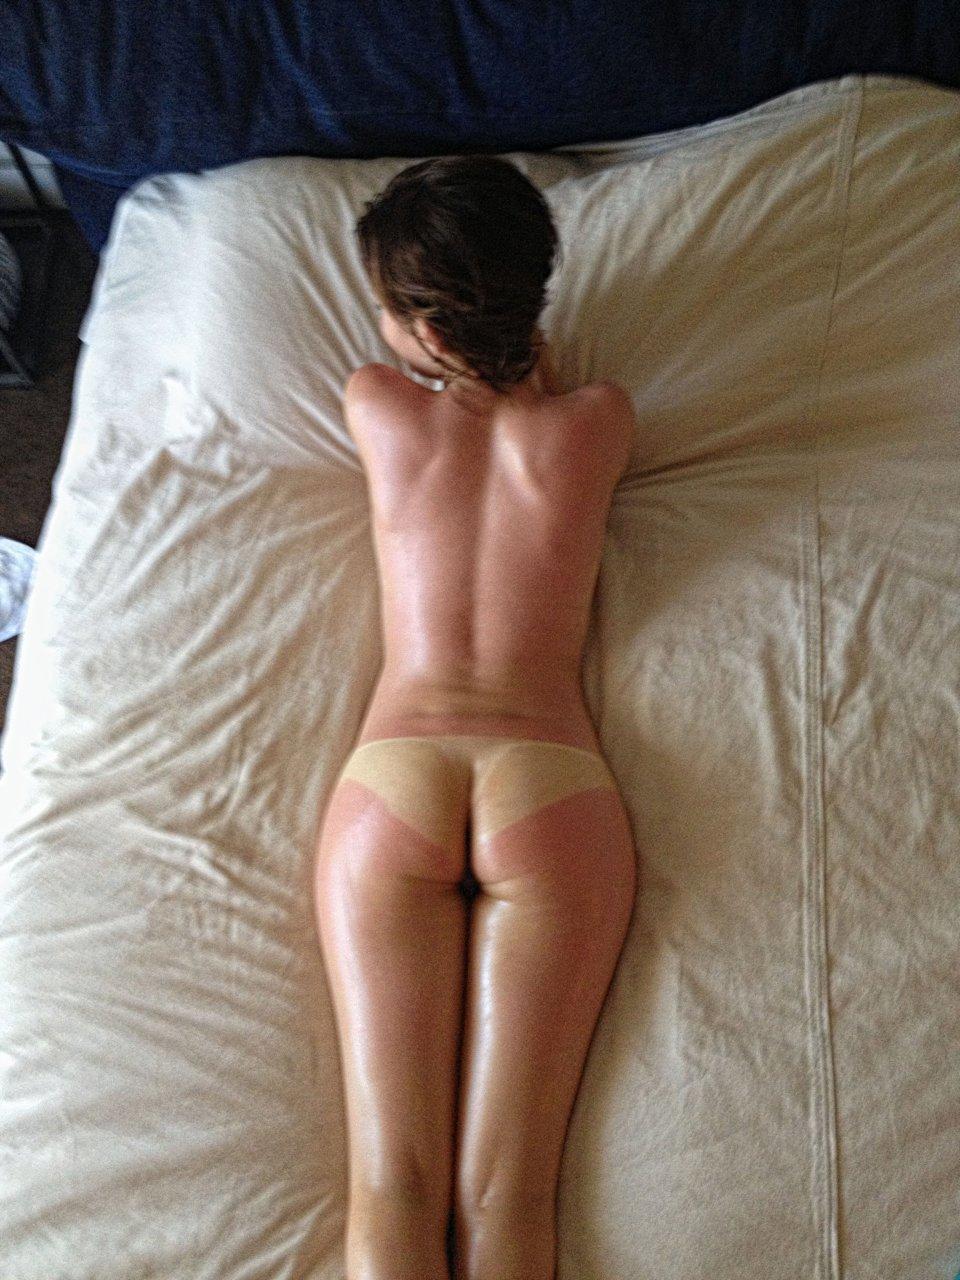 Petite brunette porn stars